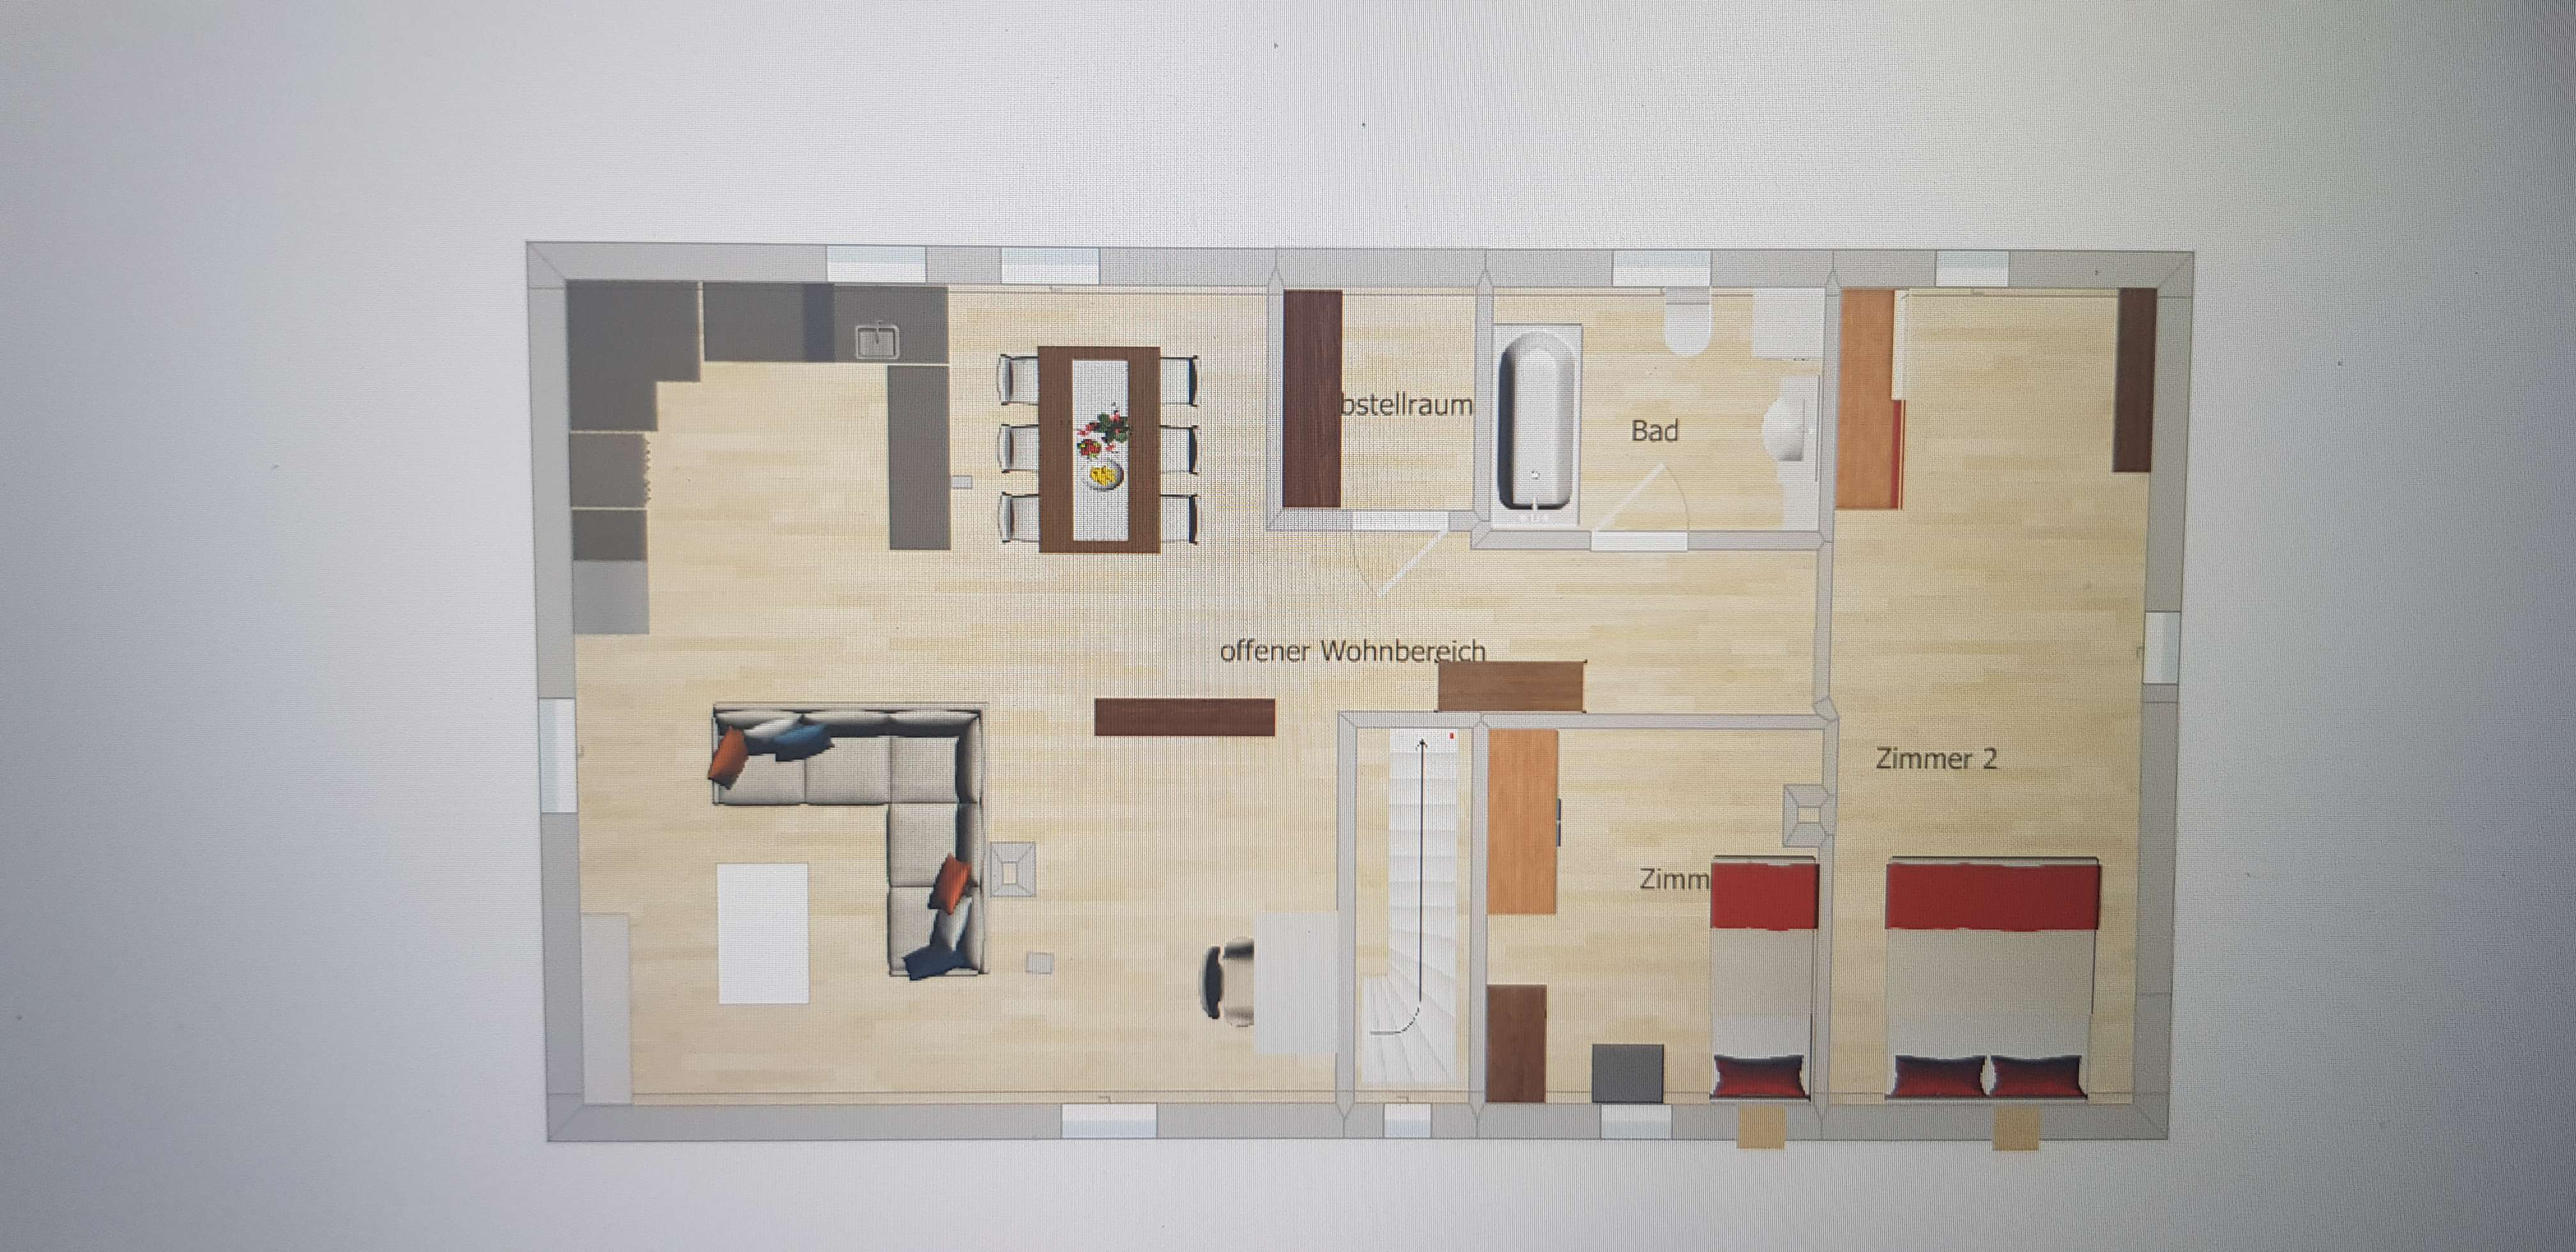 Dachgeschosswohnung, Altstadt Feuchtwangen, Kernsaniert und Erstbezug in